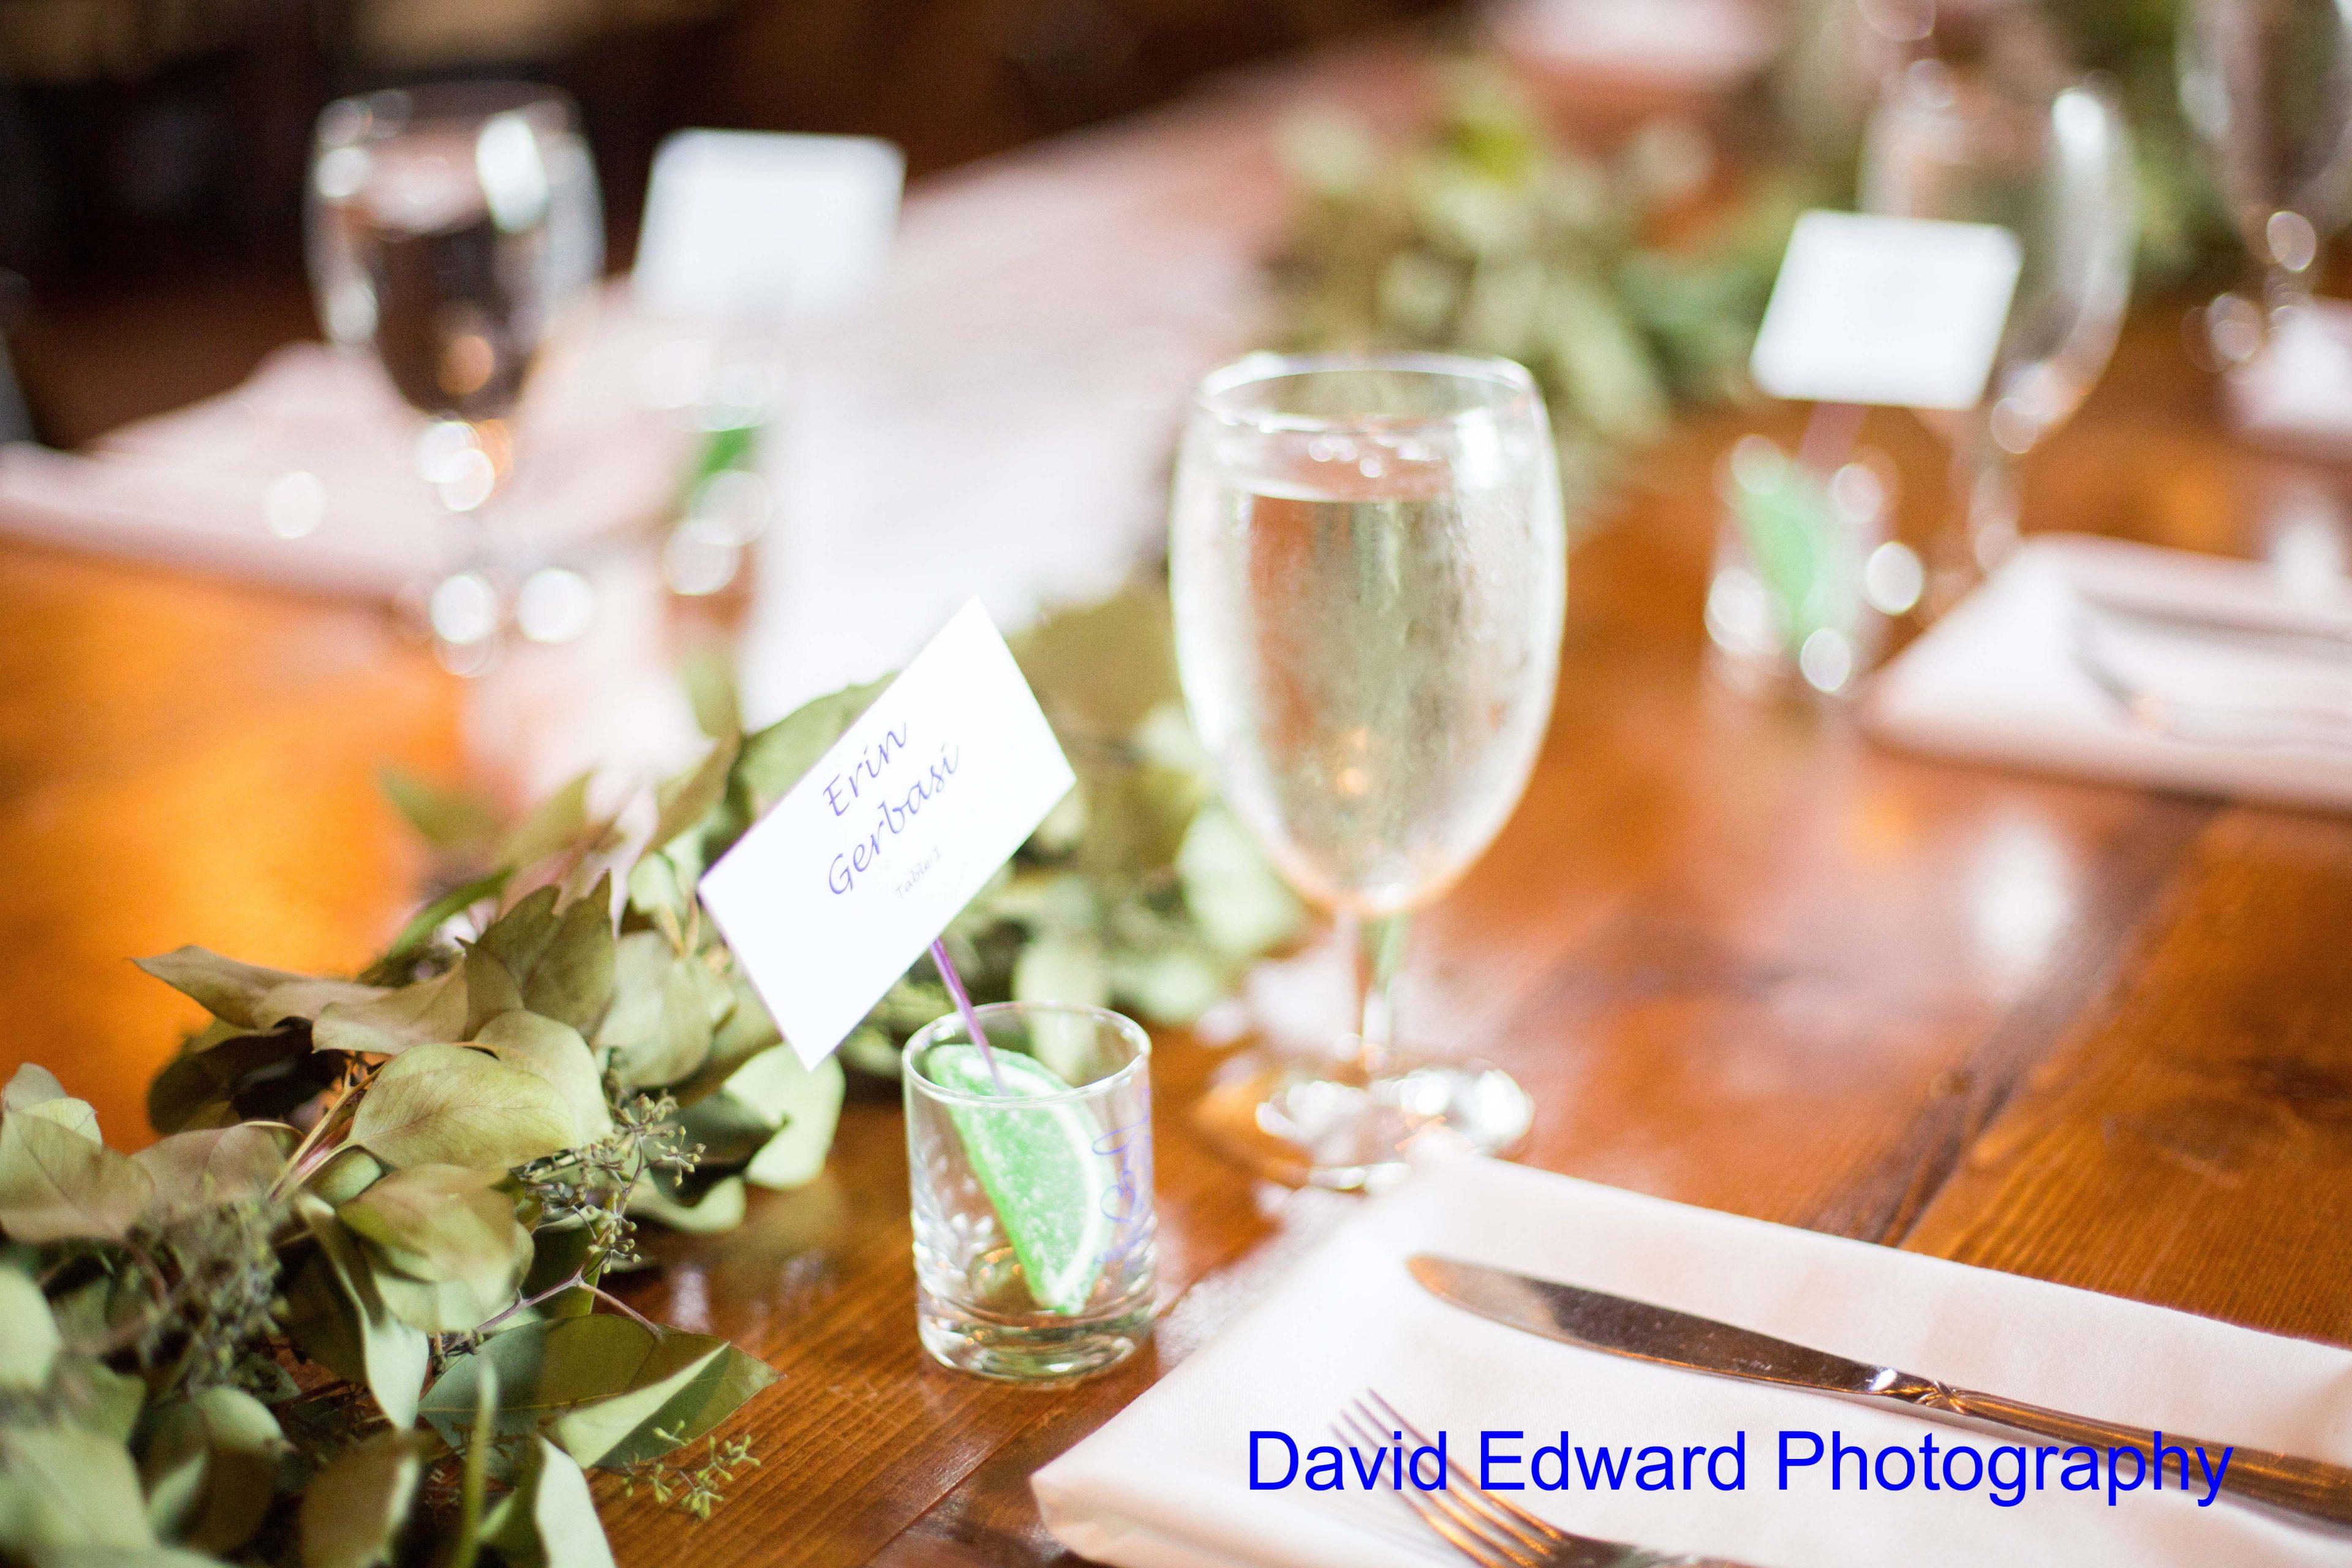 Magnificent Moments Weddings Dairy Barn David Edward Photography(7) Min